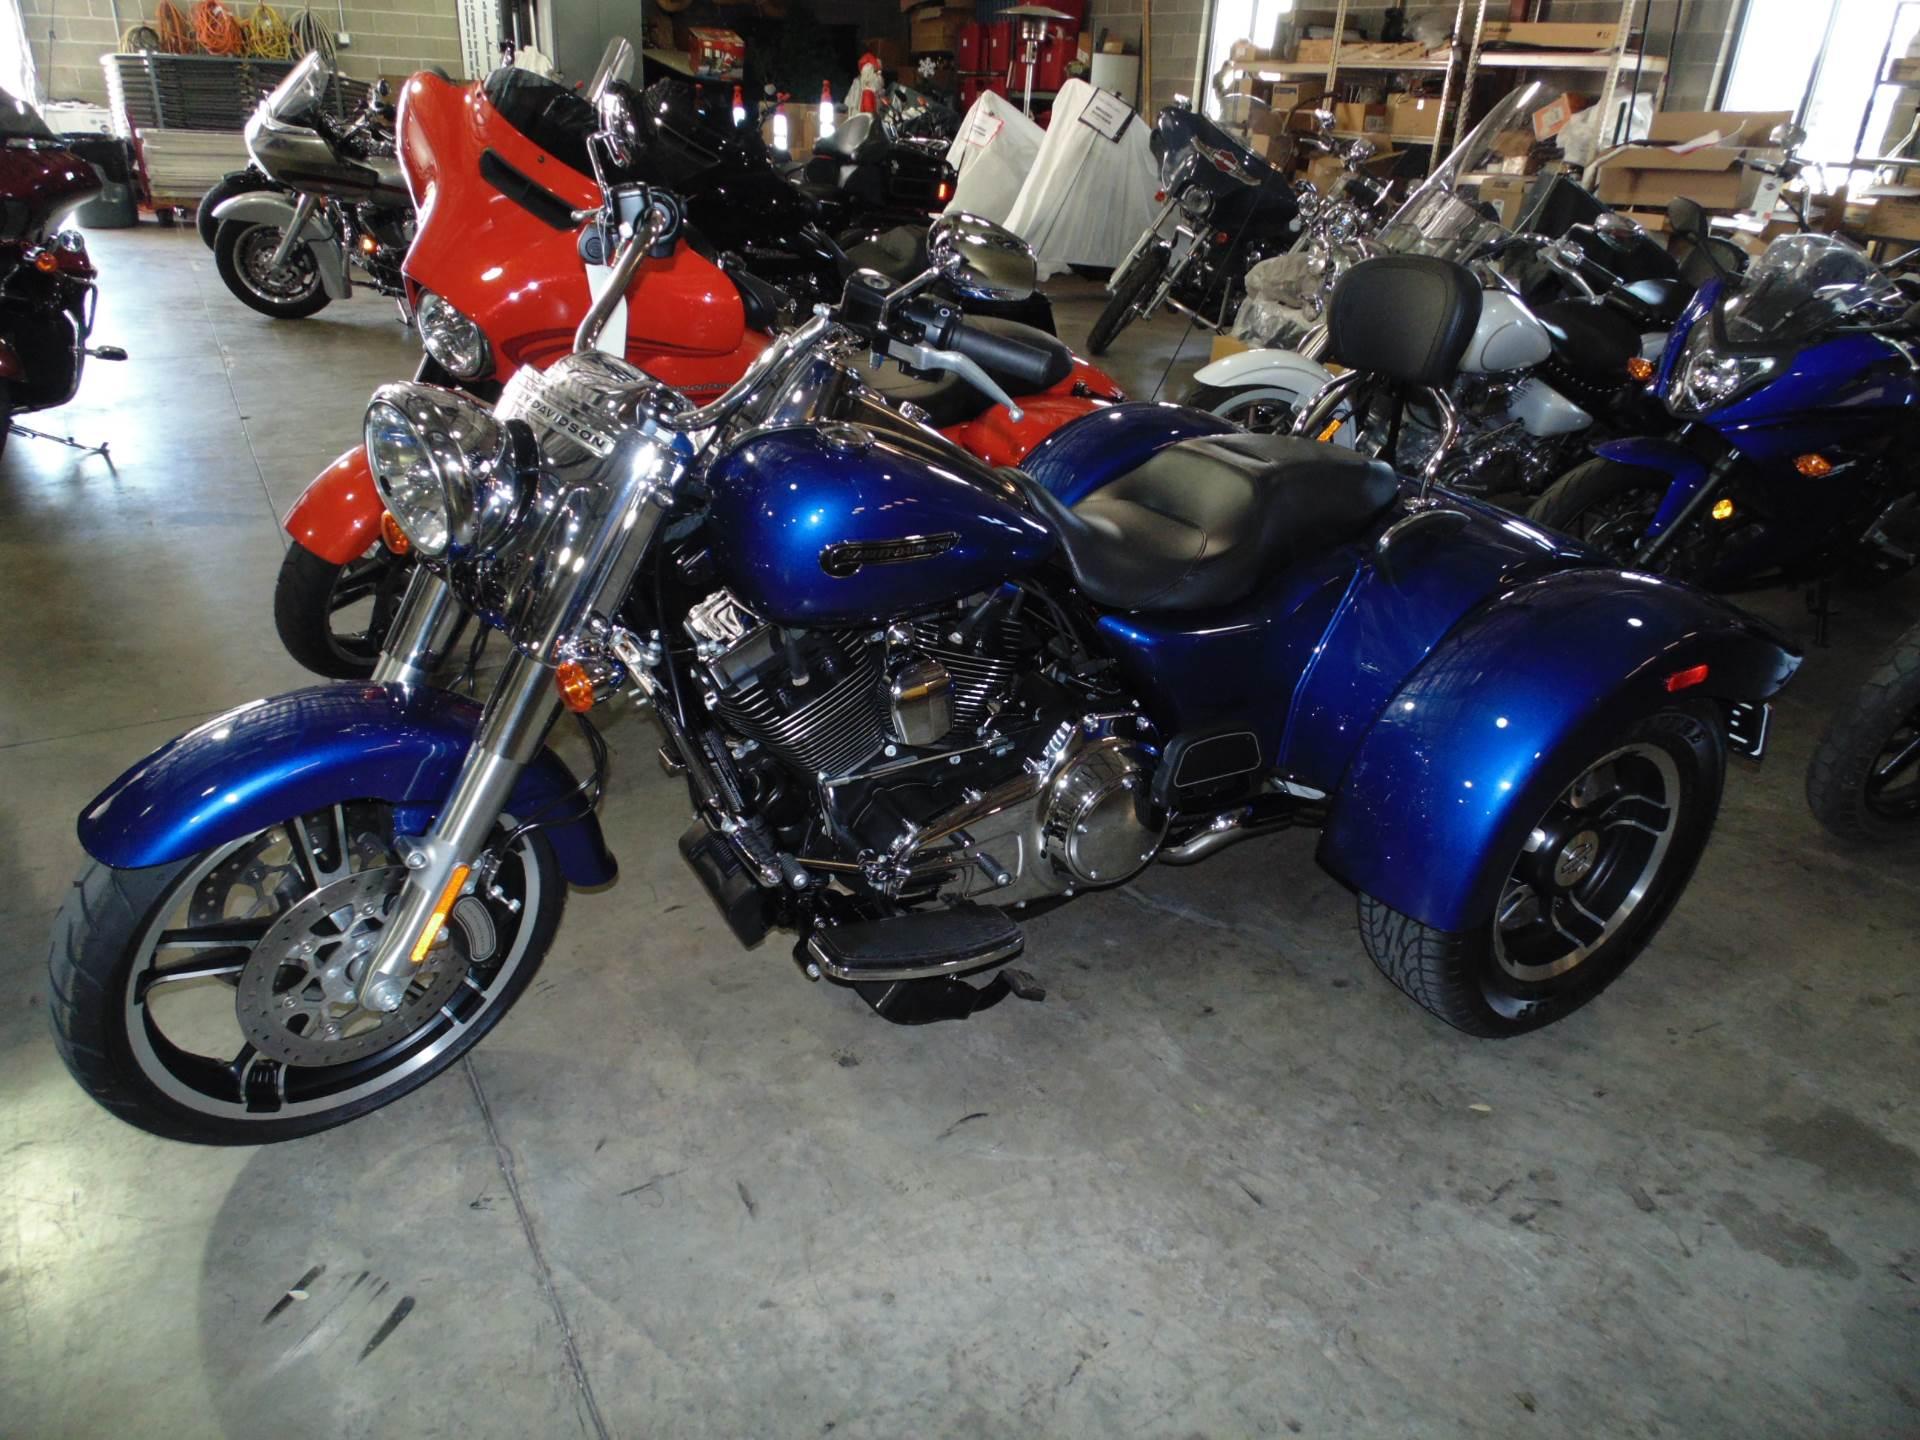 2015 Harley-Davidson Freewheeler for sale 15290